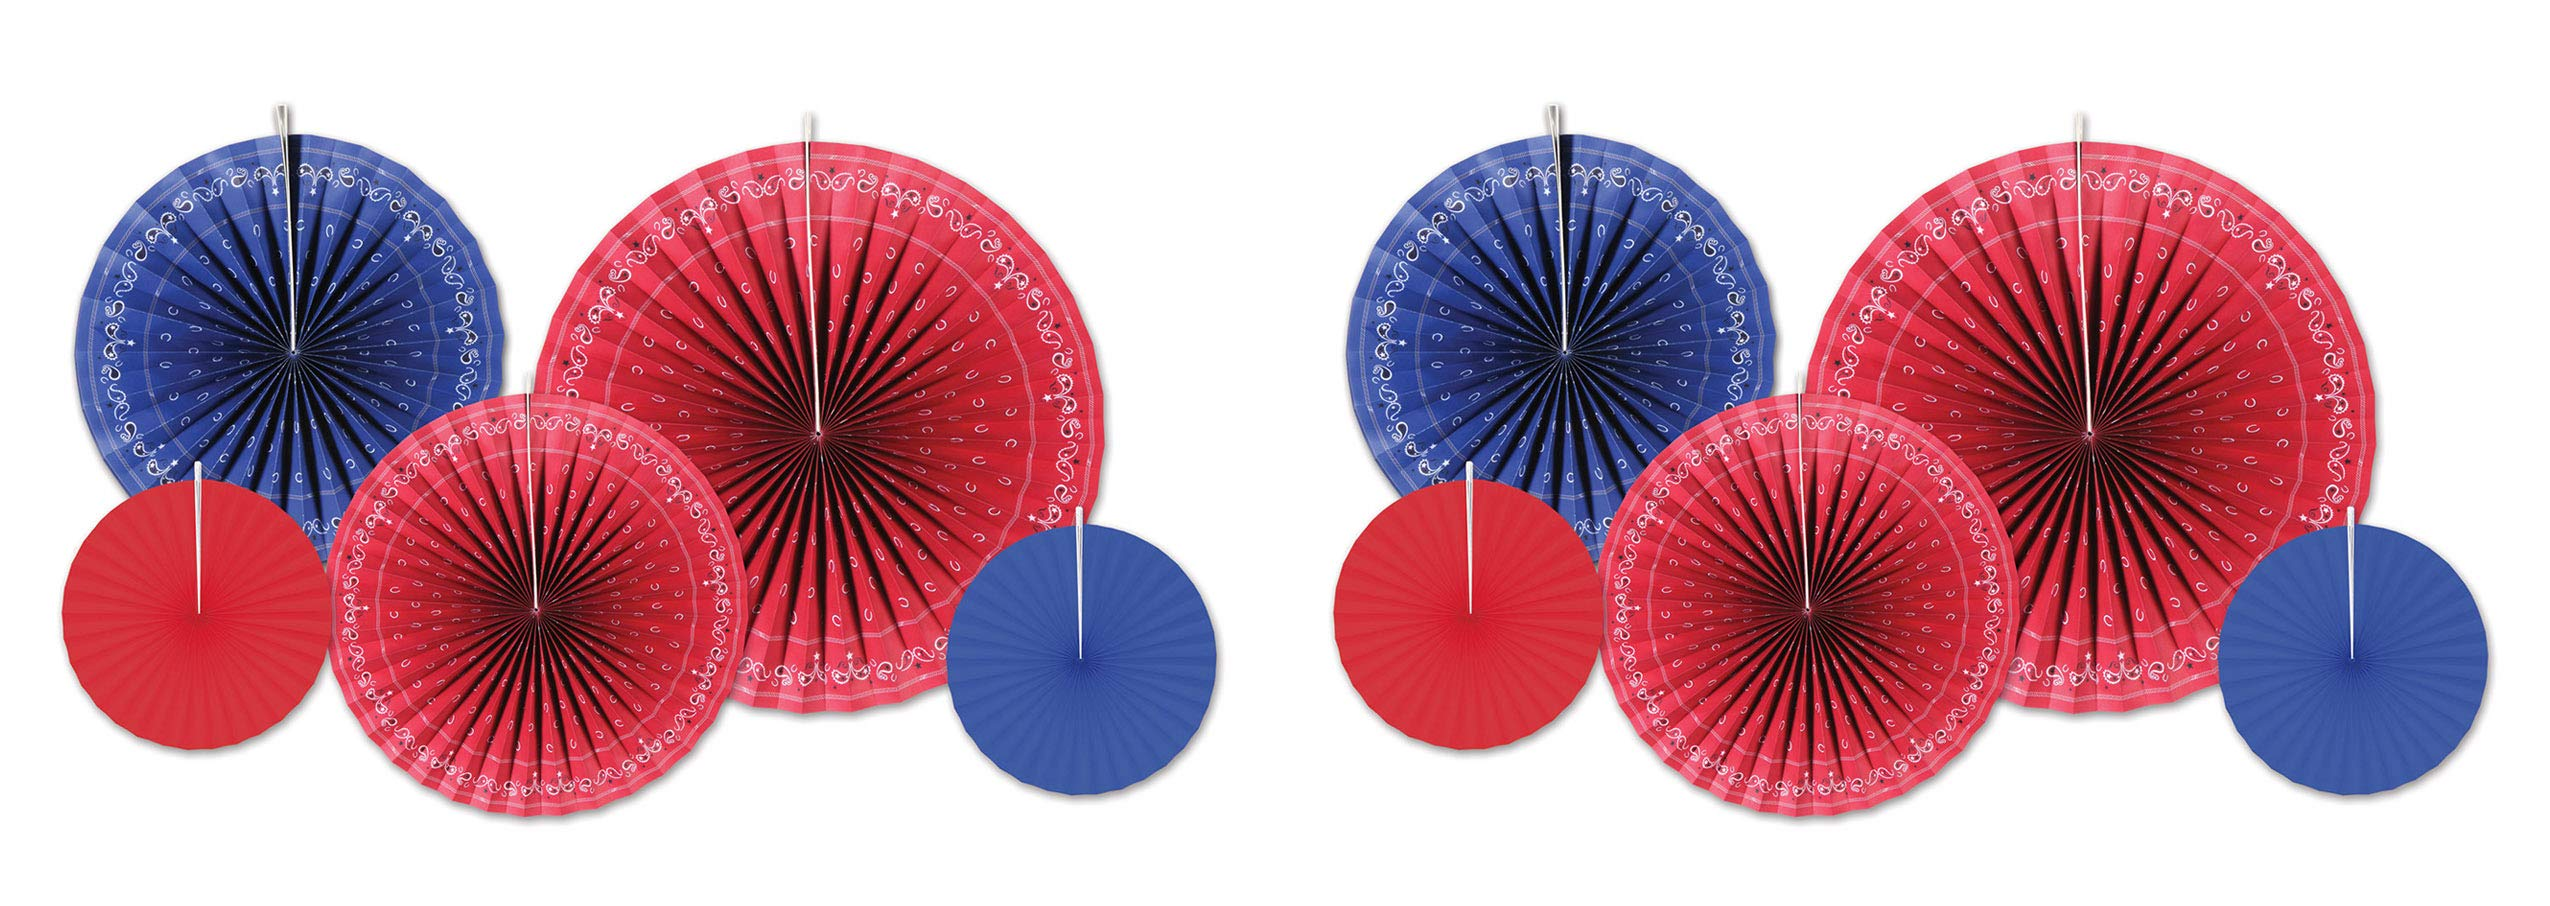 Beistle 59542 Bandana Accordion Paper Fans 10 Piece, 9'' - 16'', Red/Blue